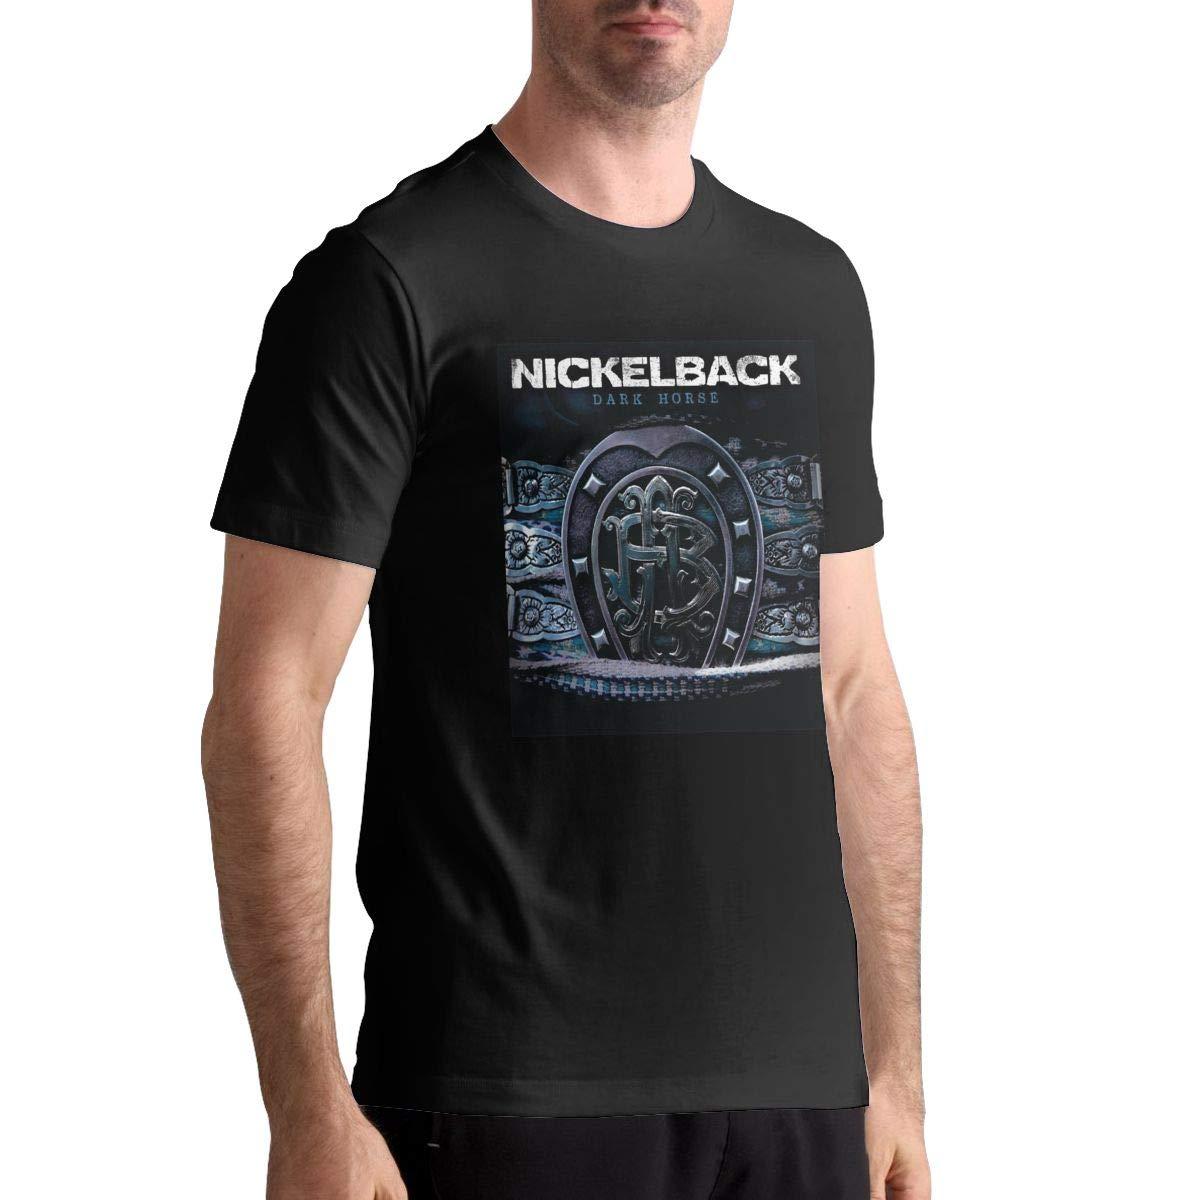 Nickelback Dark Horse Mans Music Short Sleeve T Shirt